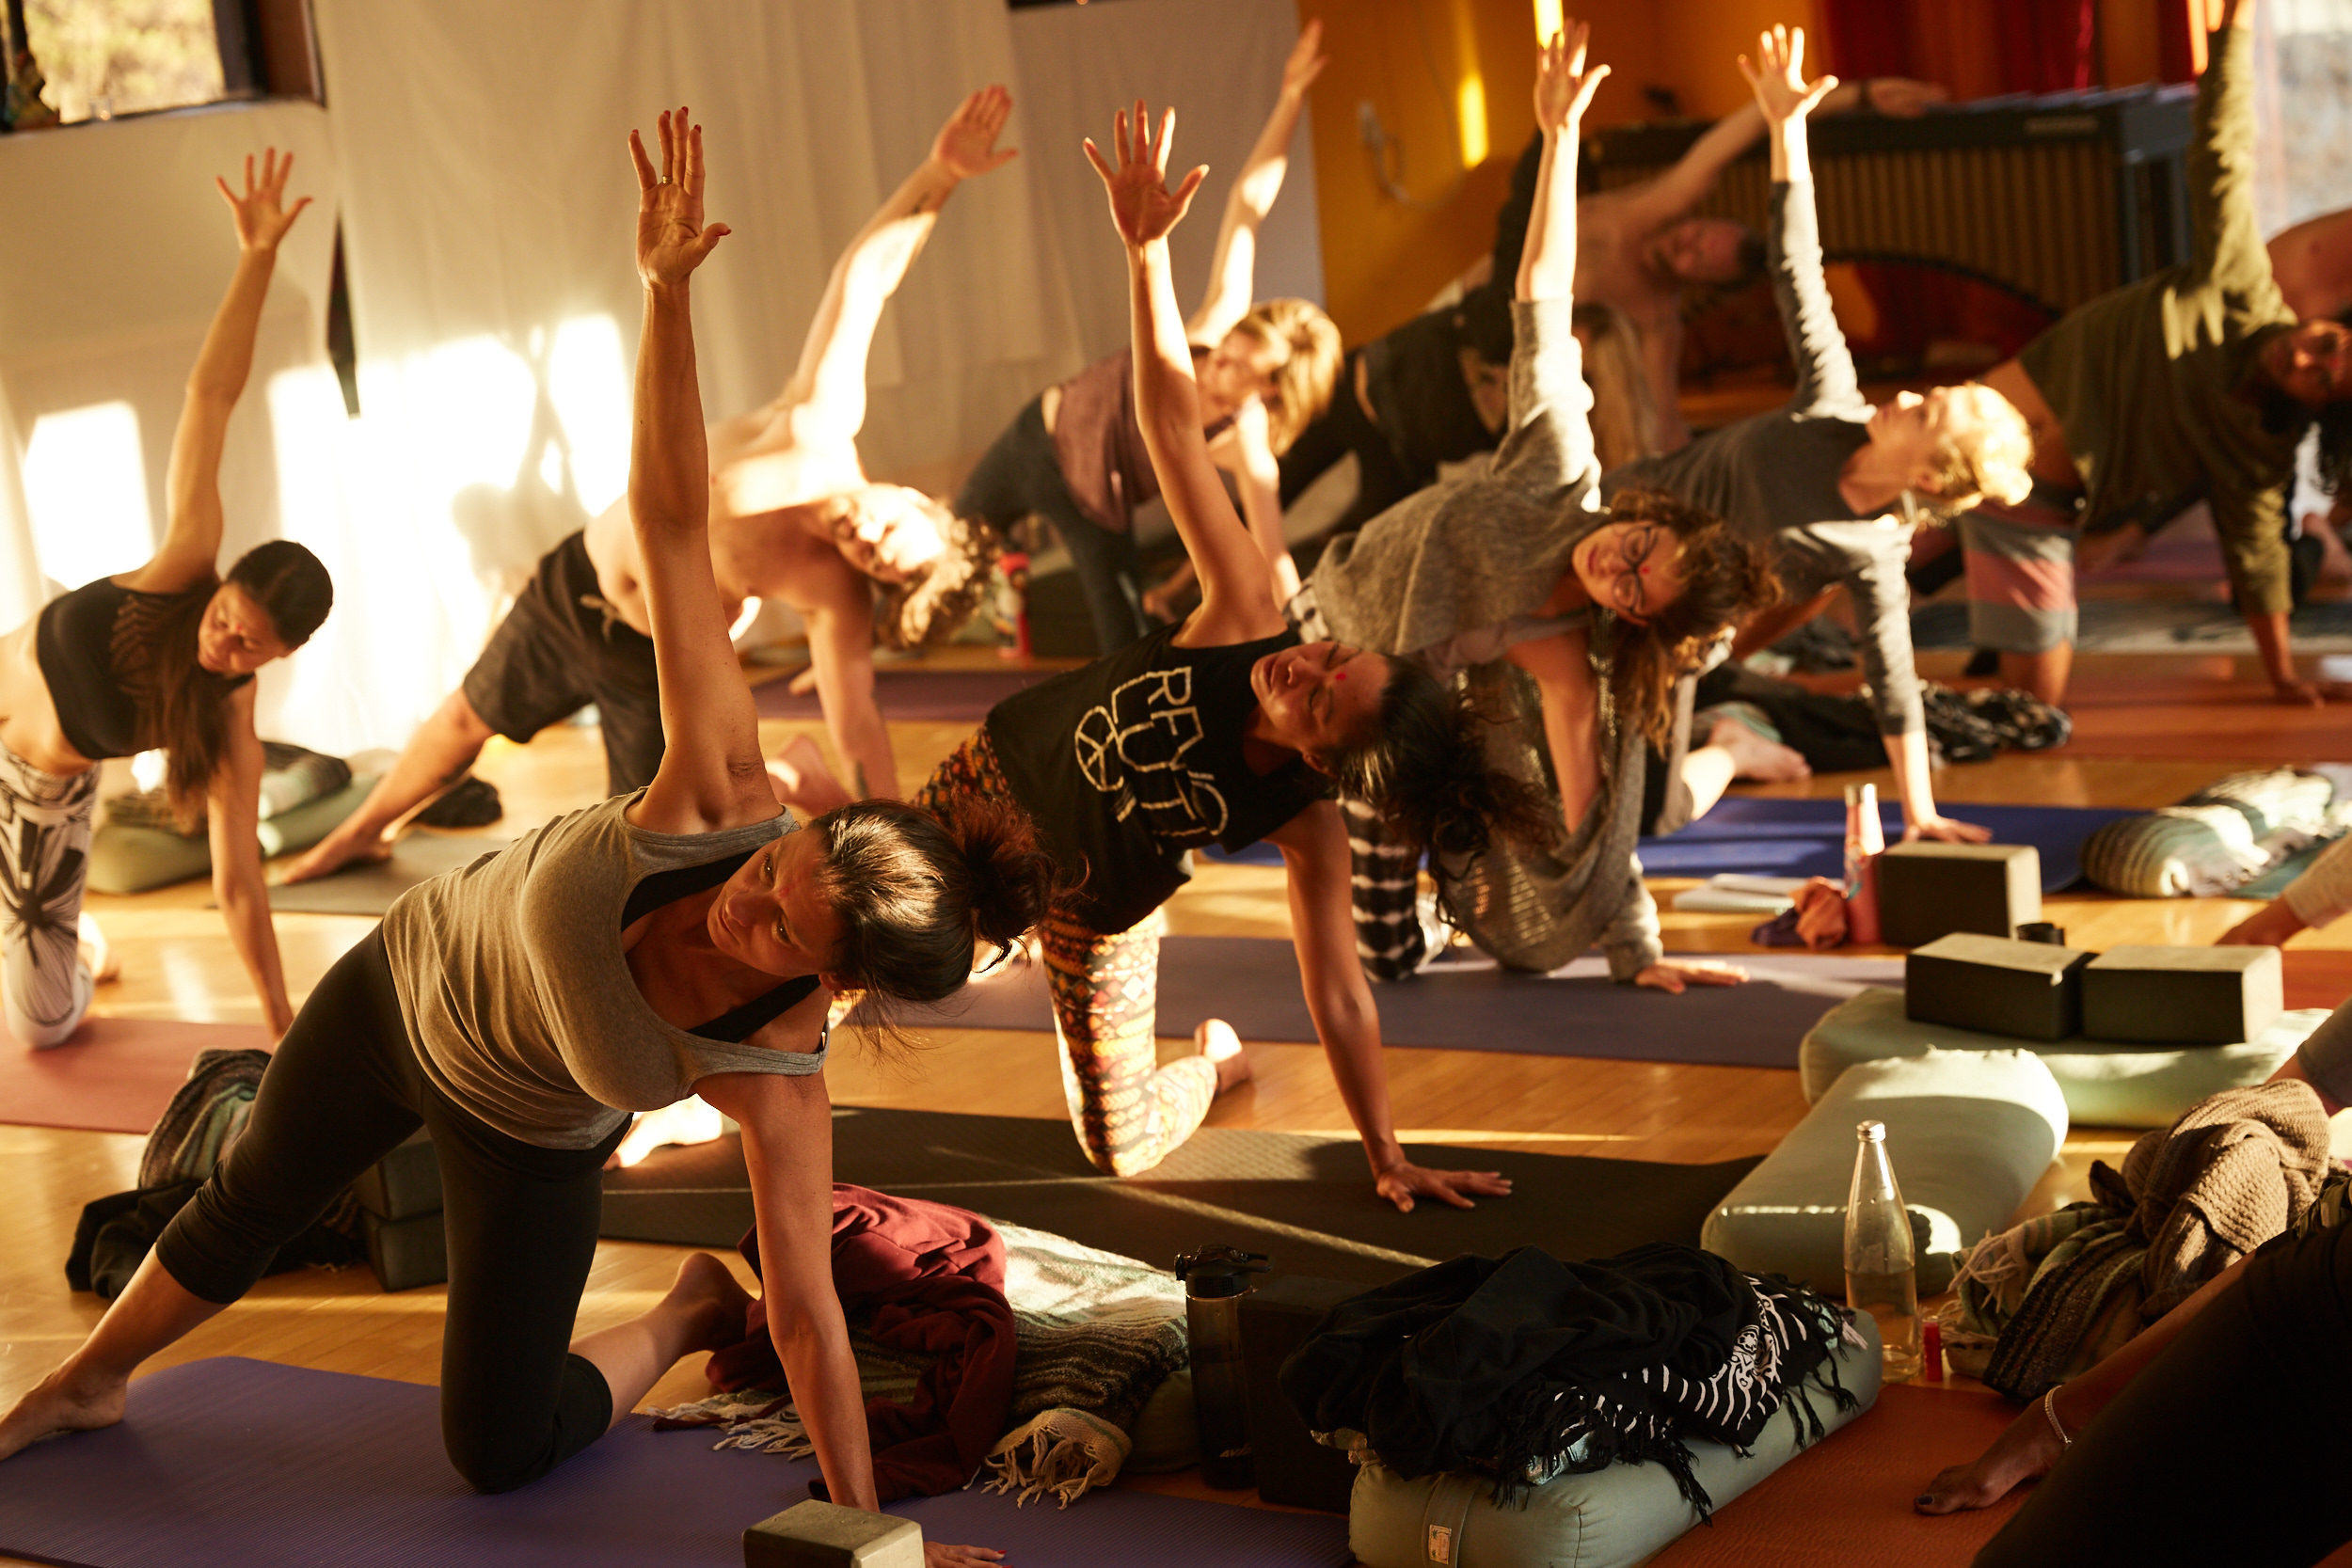 Vinyasa Yoga Teacher Training in Costa Rica, by Shivakali Yoga, a Nosara Costa Rica-based Yoga Teacher Training and Yoga Certification Program that Certifies Yoga Teachers on Retreat.